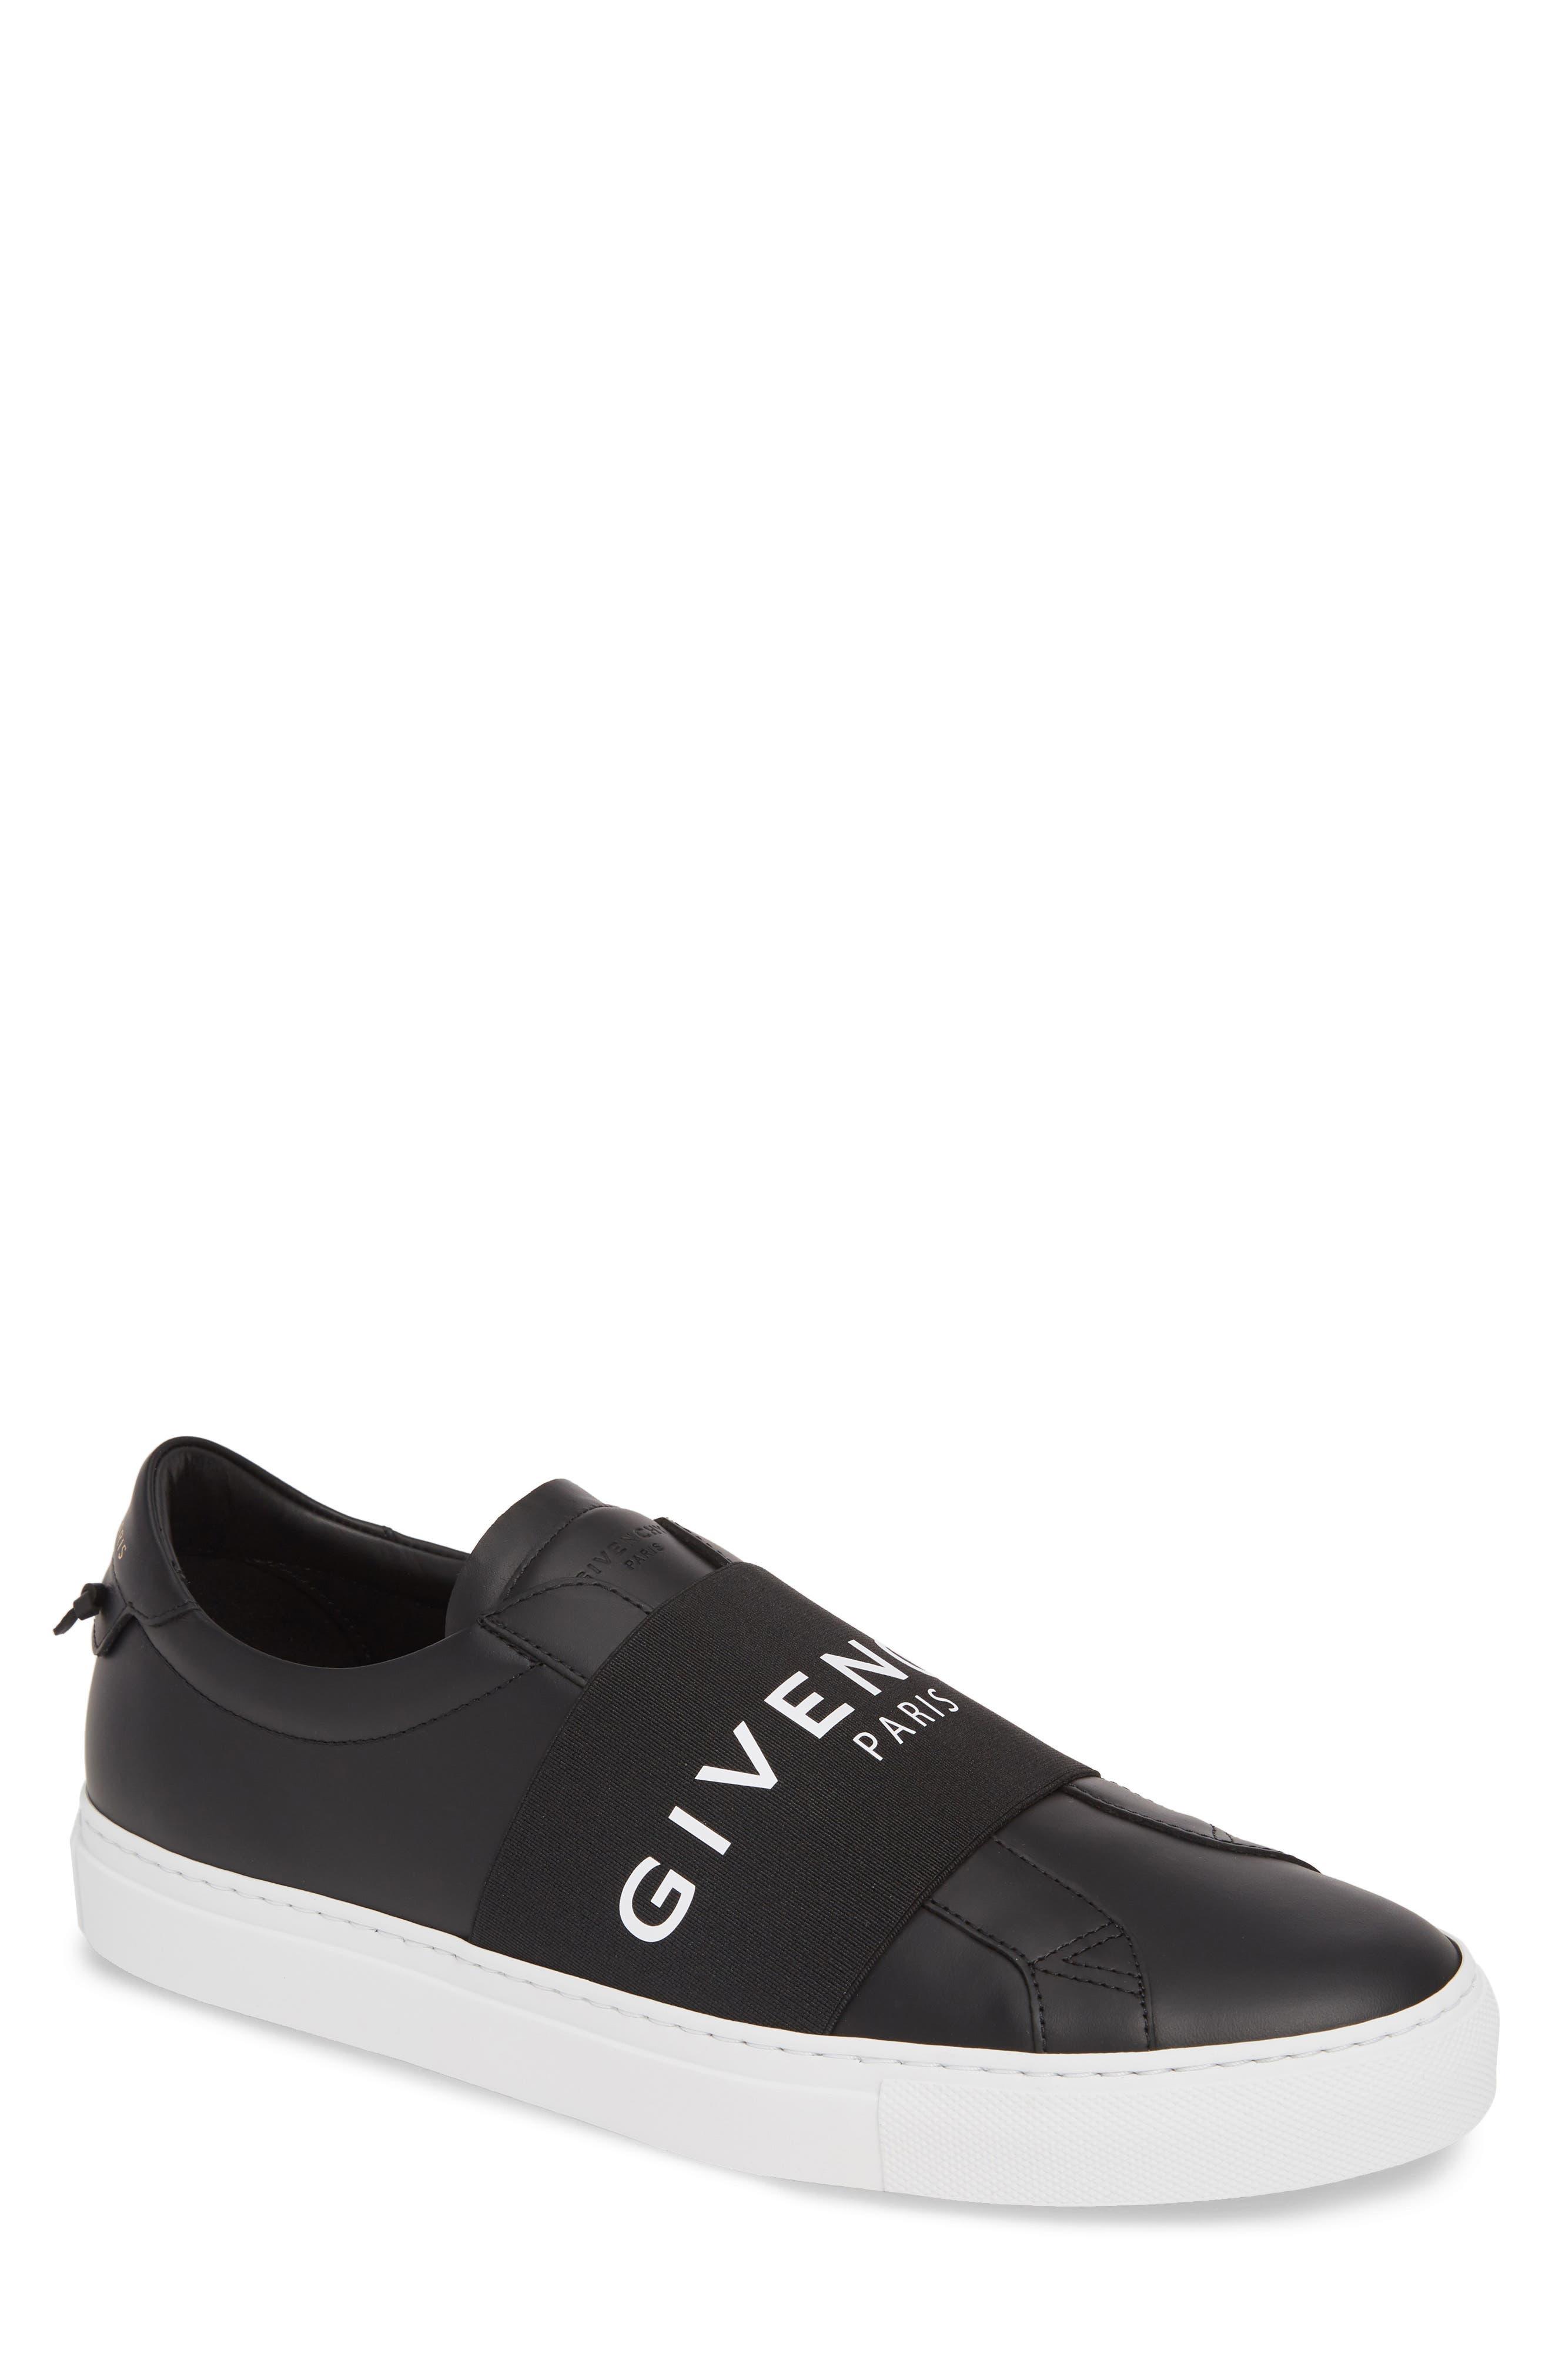 Givenchy Urban Knots Sneaker (Men